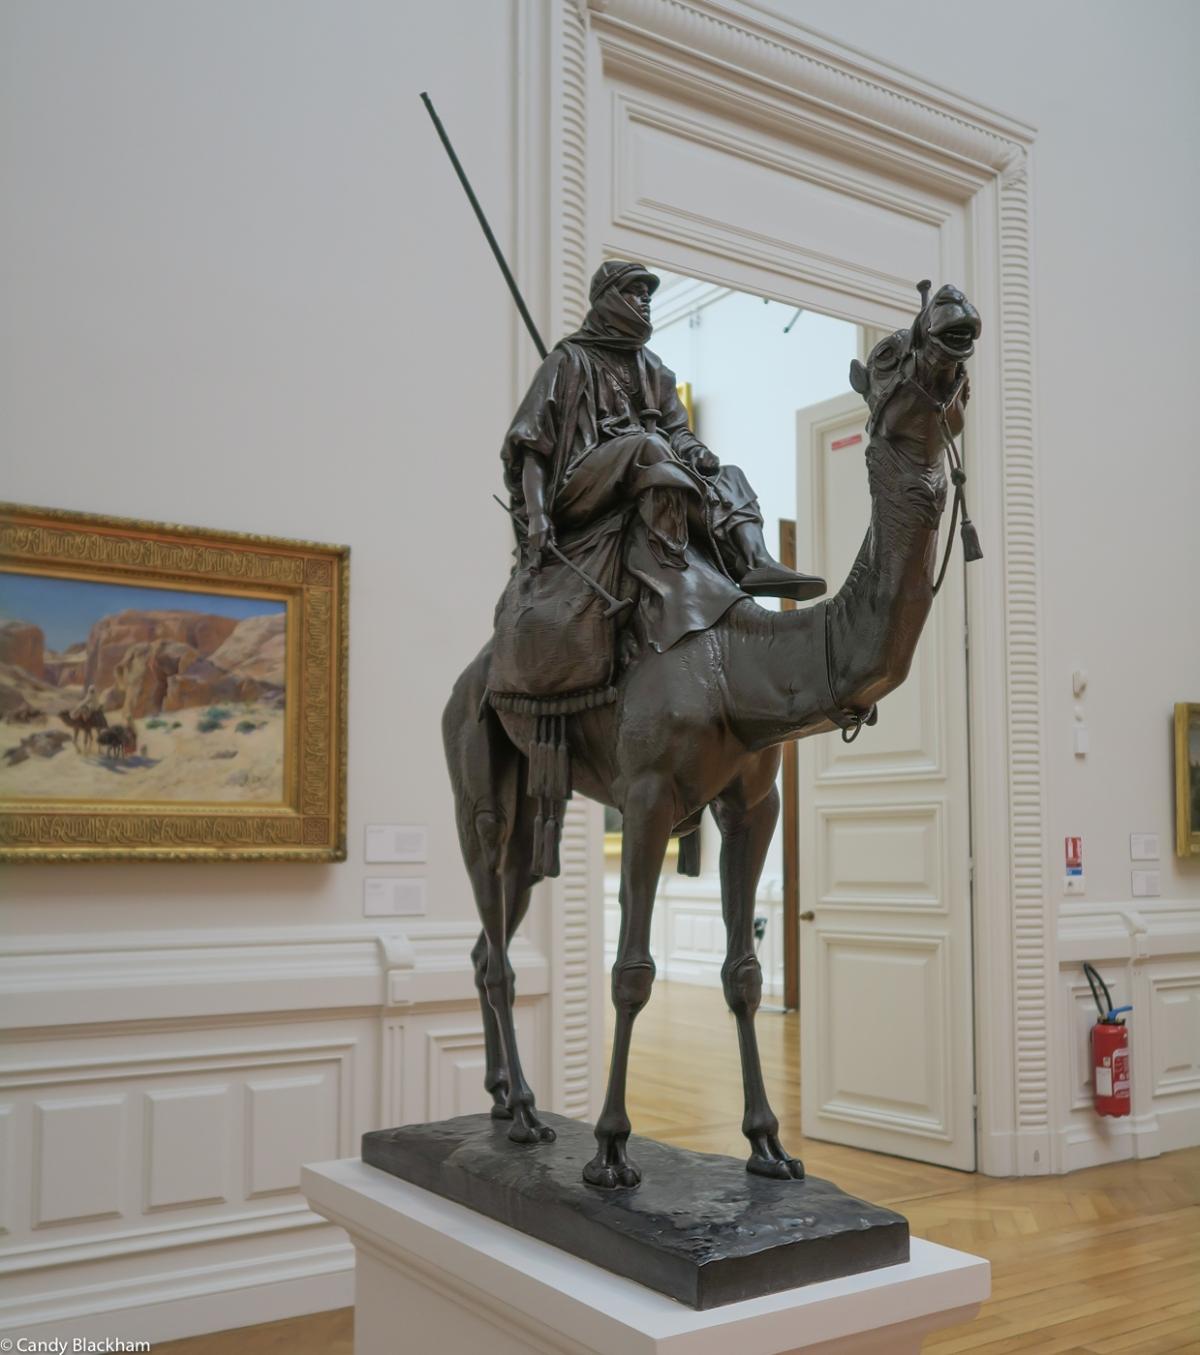 Henri Jacquemart, 'Camel Driver', 1869